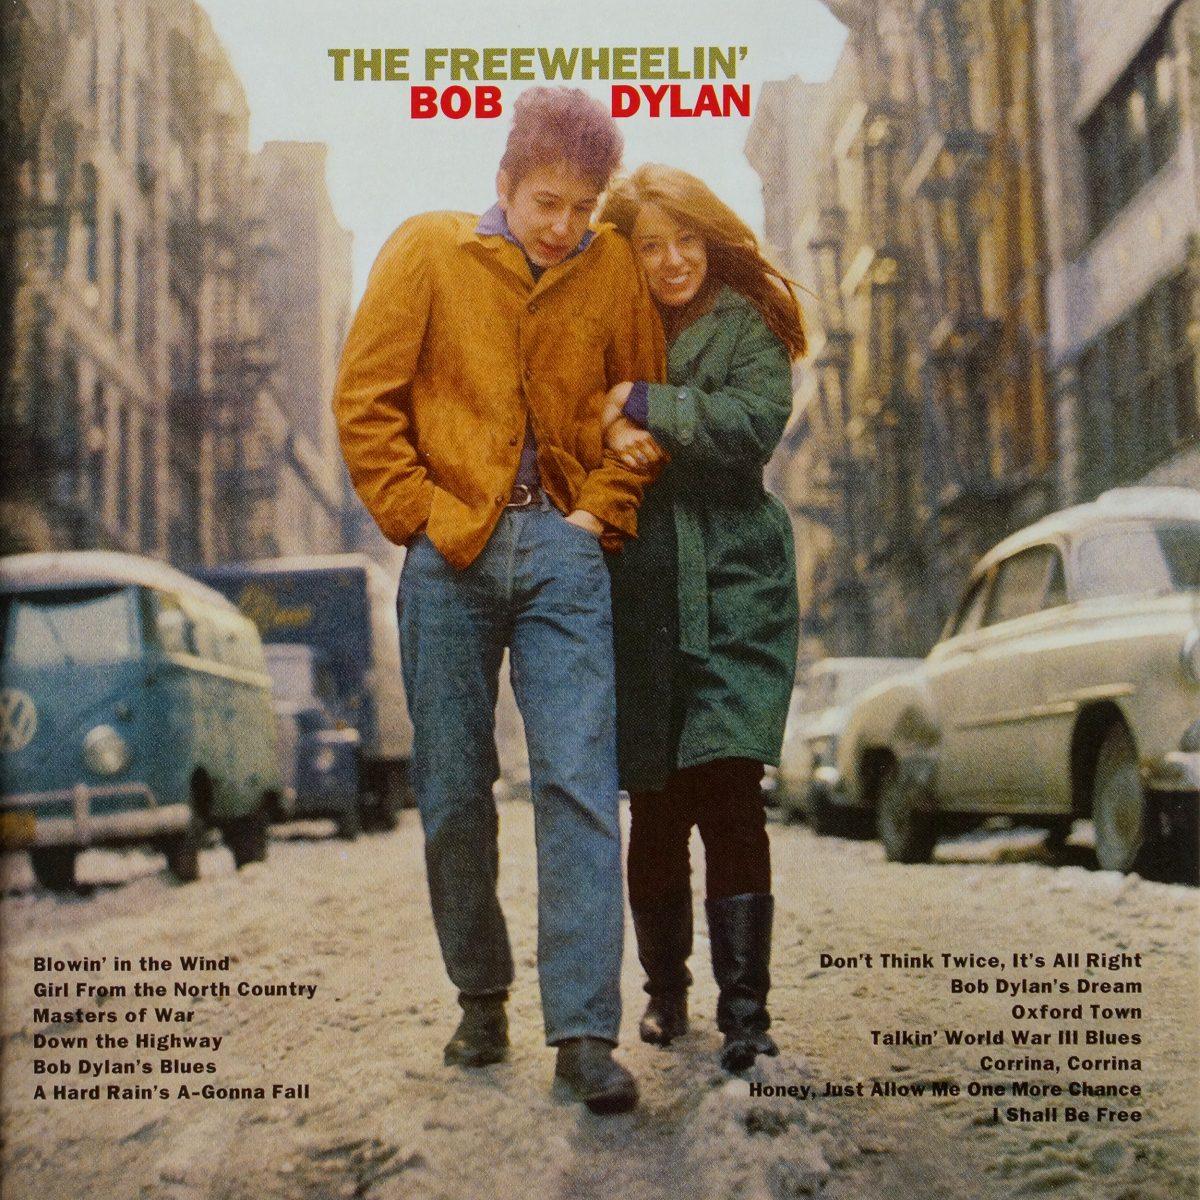 Dylan, Bob: The Freewheelin' Bob Dylan (1963)